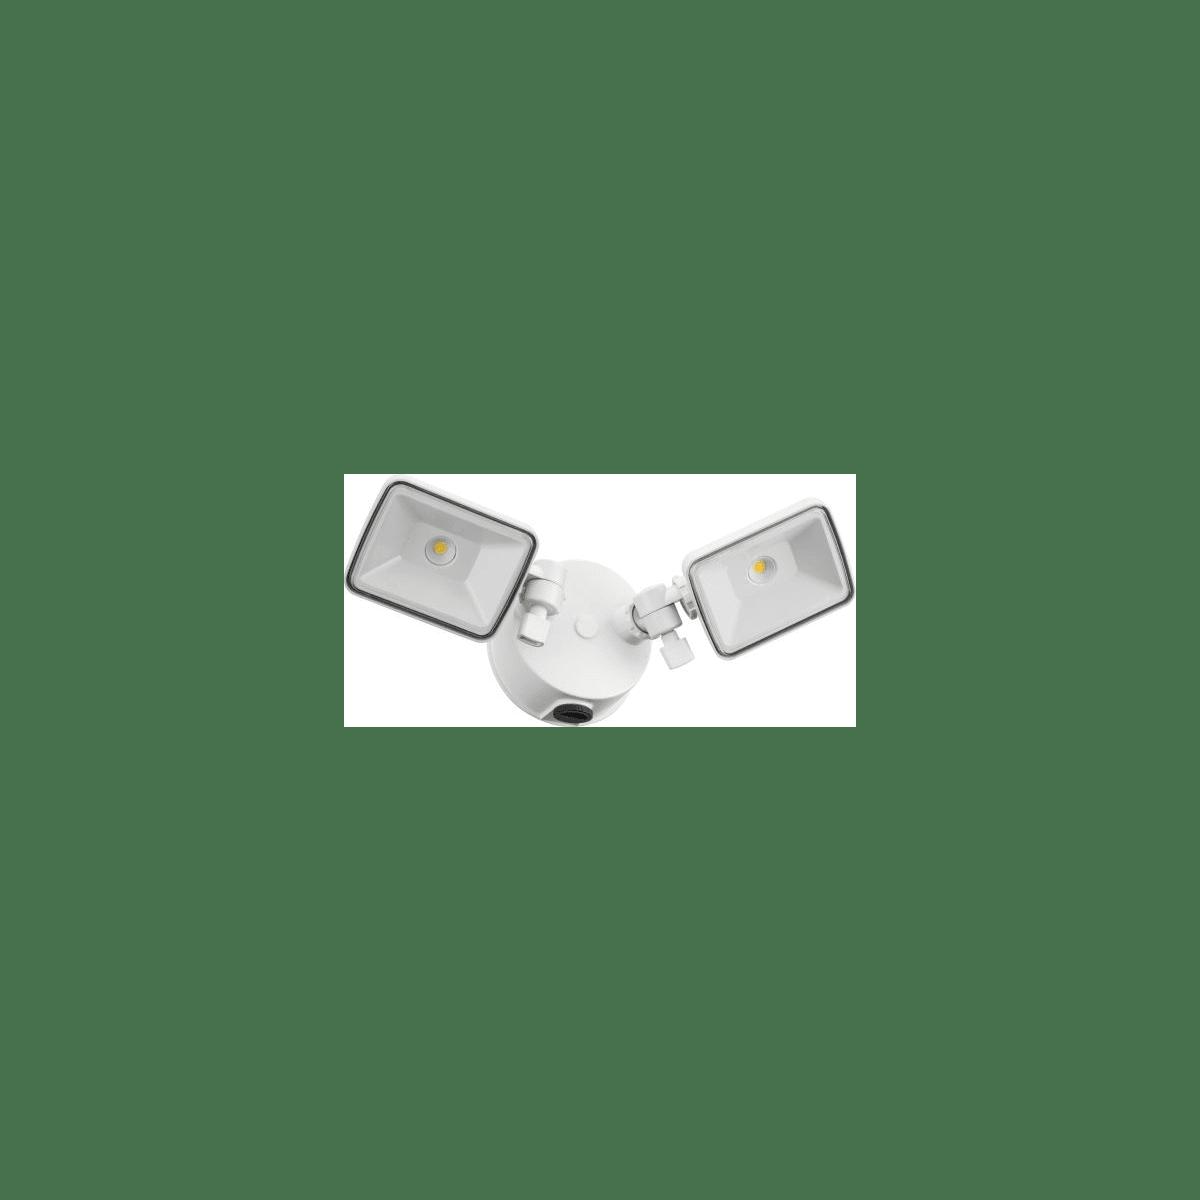 lithonia lighting olf 2sh 40k 120 pe wh m4